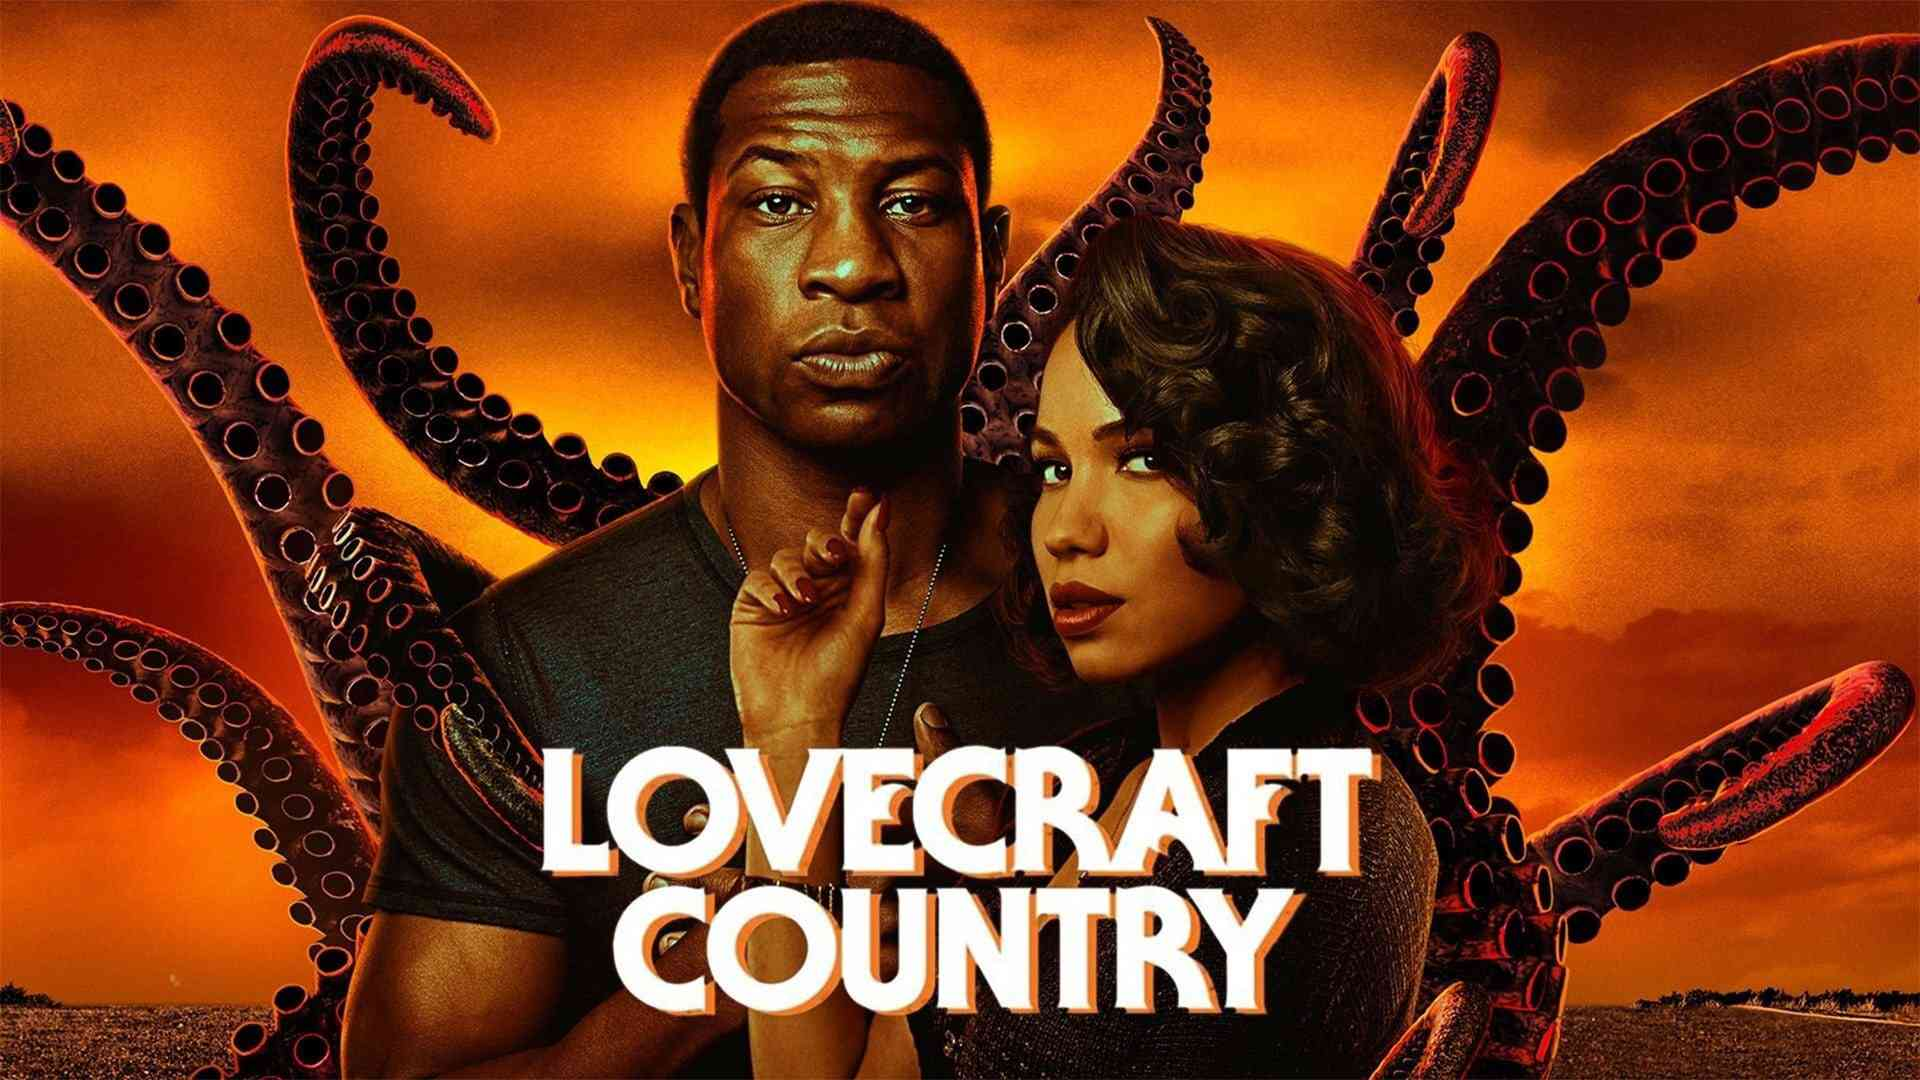 Jonathan Majors and Jurnee Smollett in Lovecraft Country